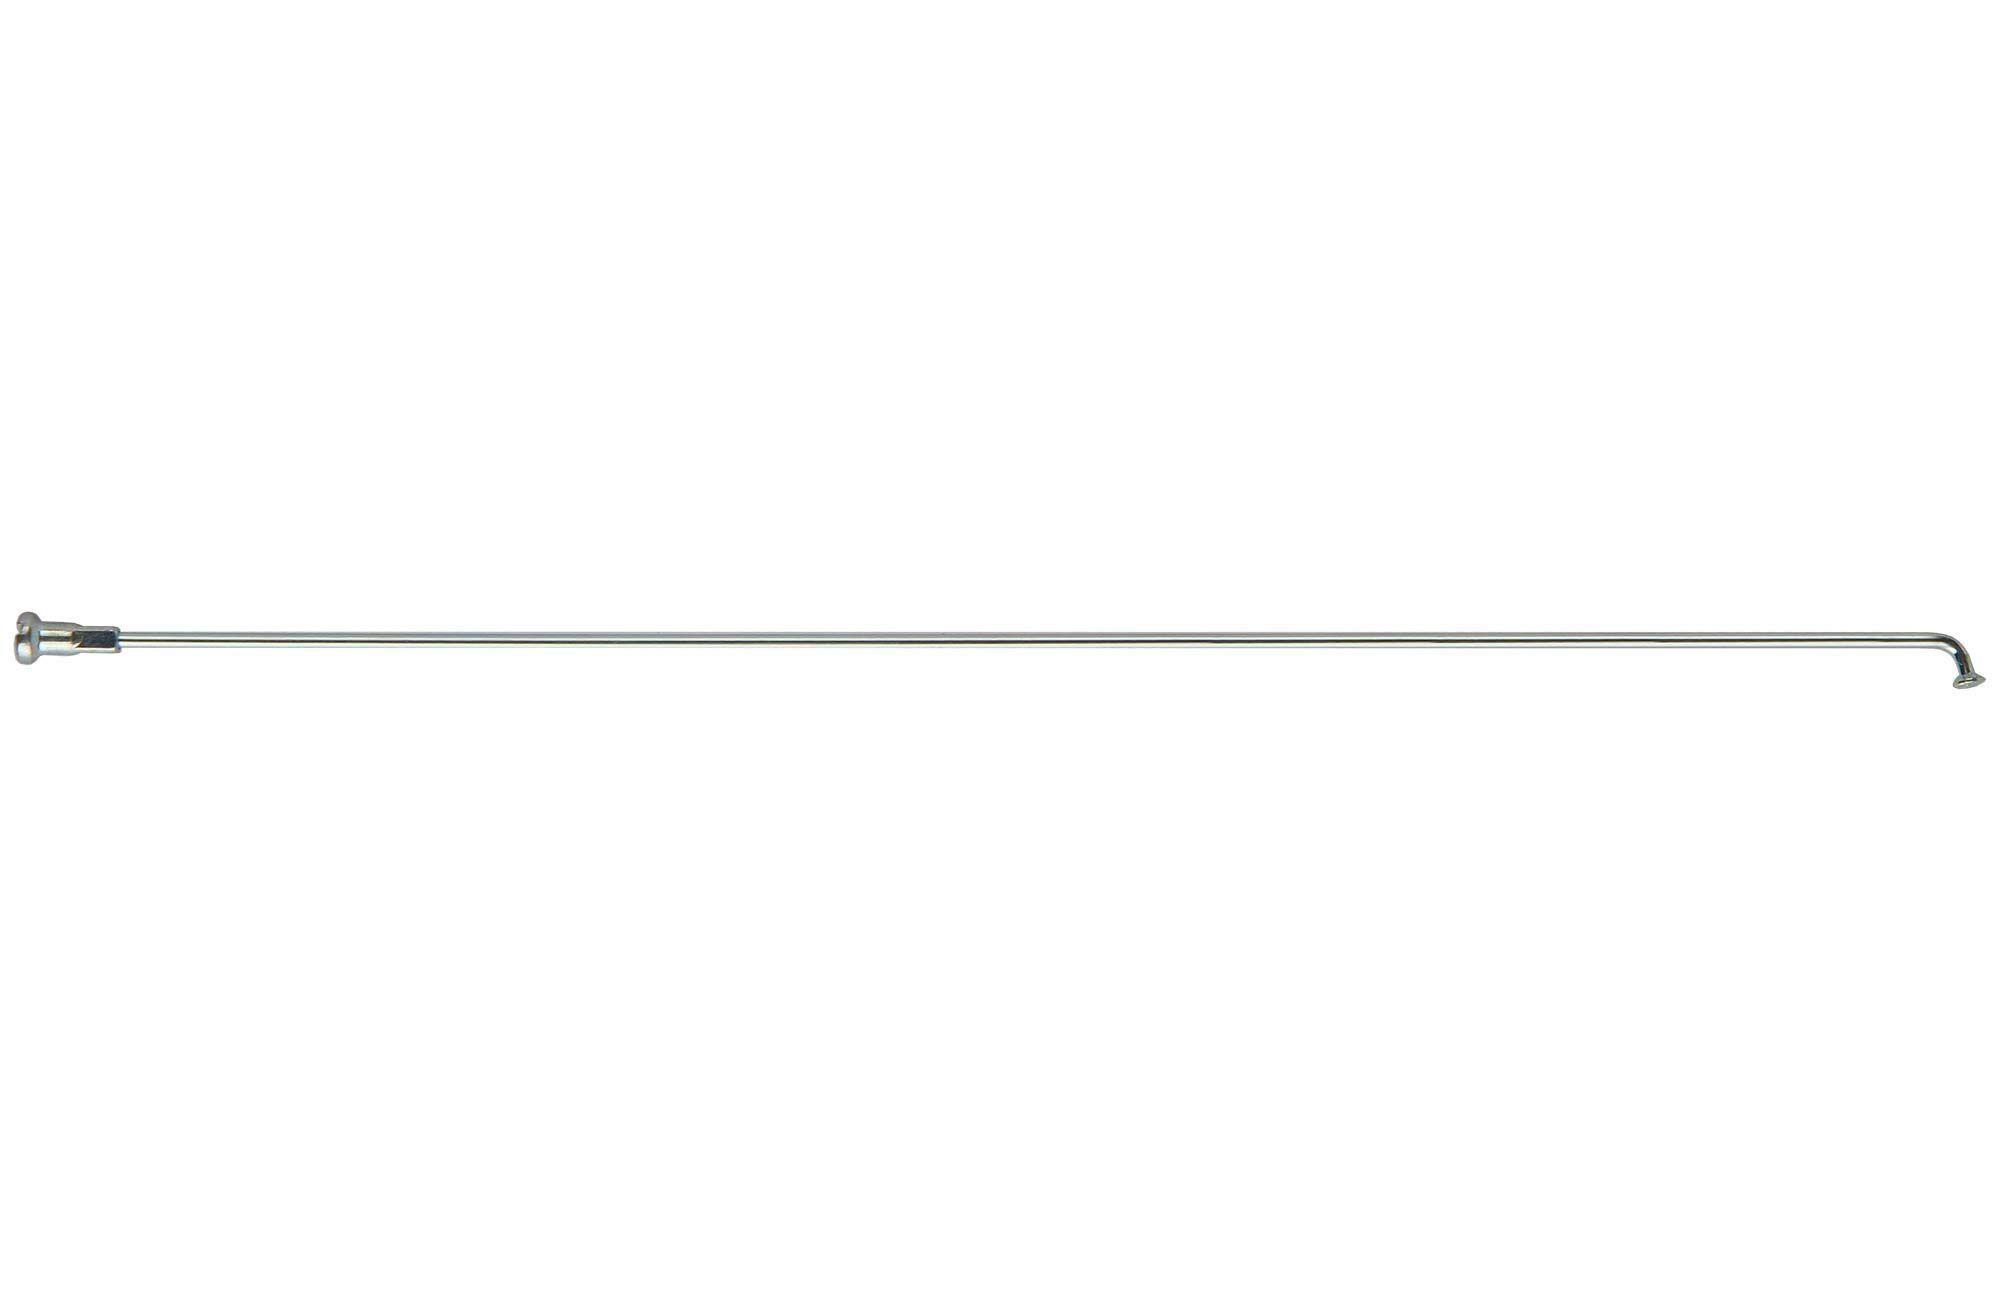 Запчасть Stels с ниппелем 235 мм 24